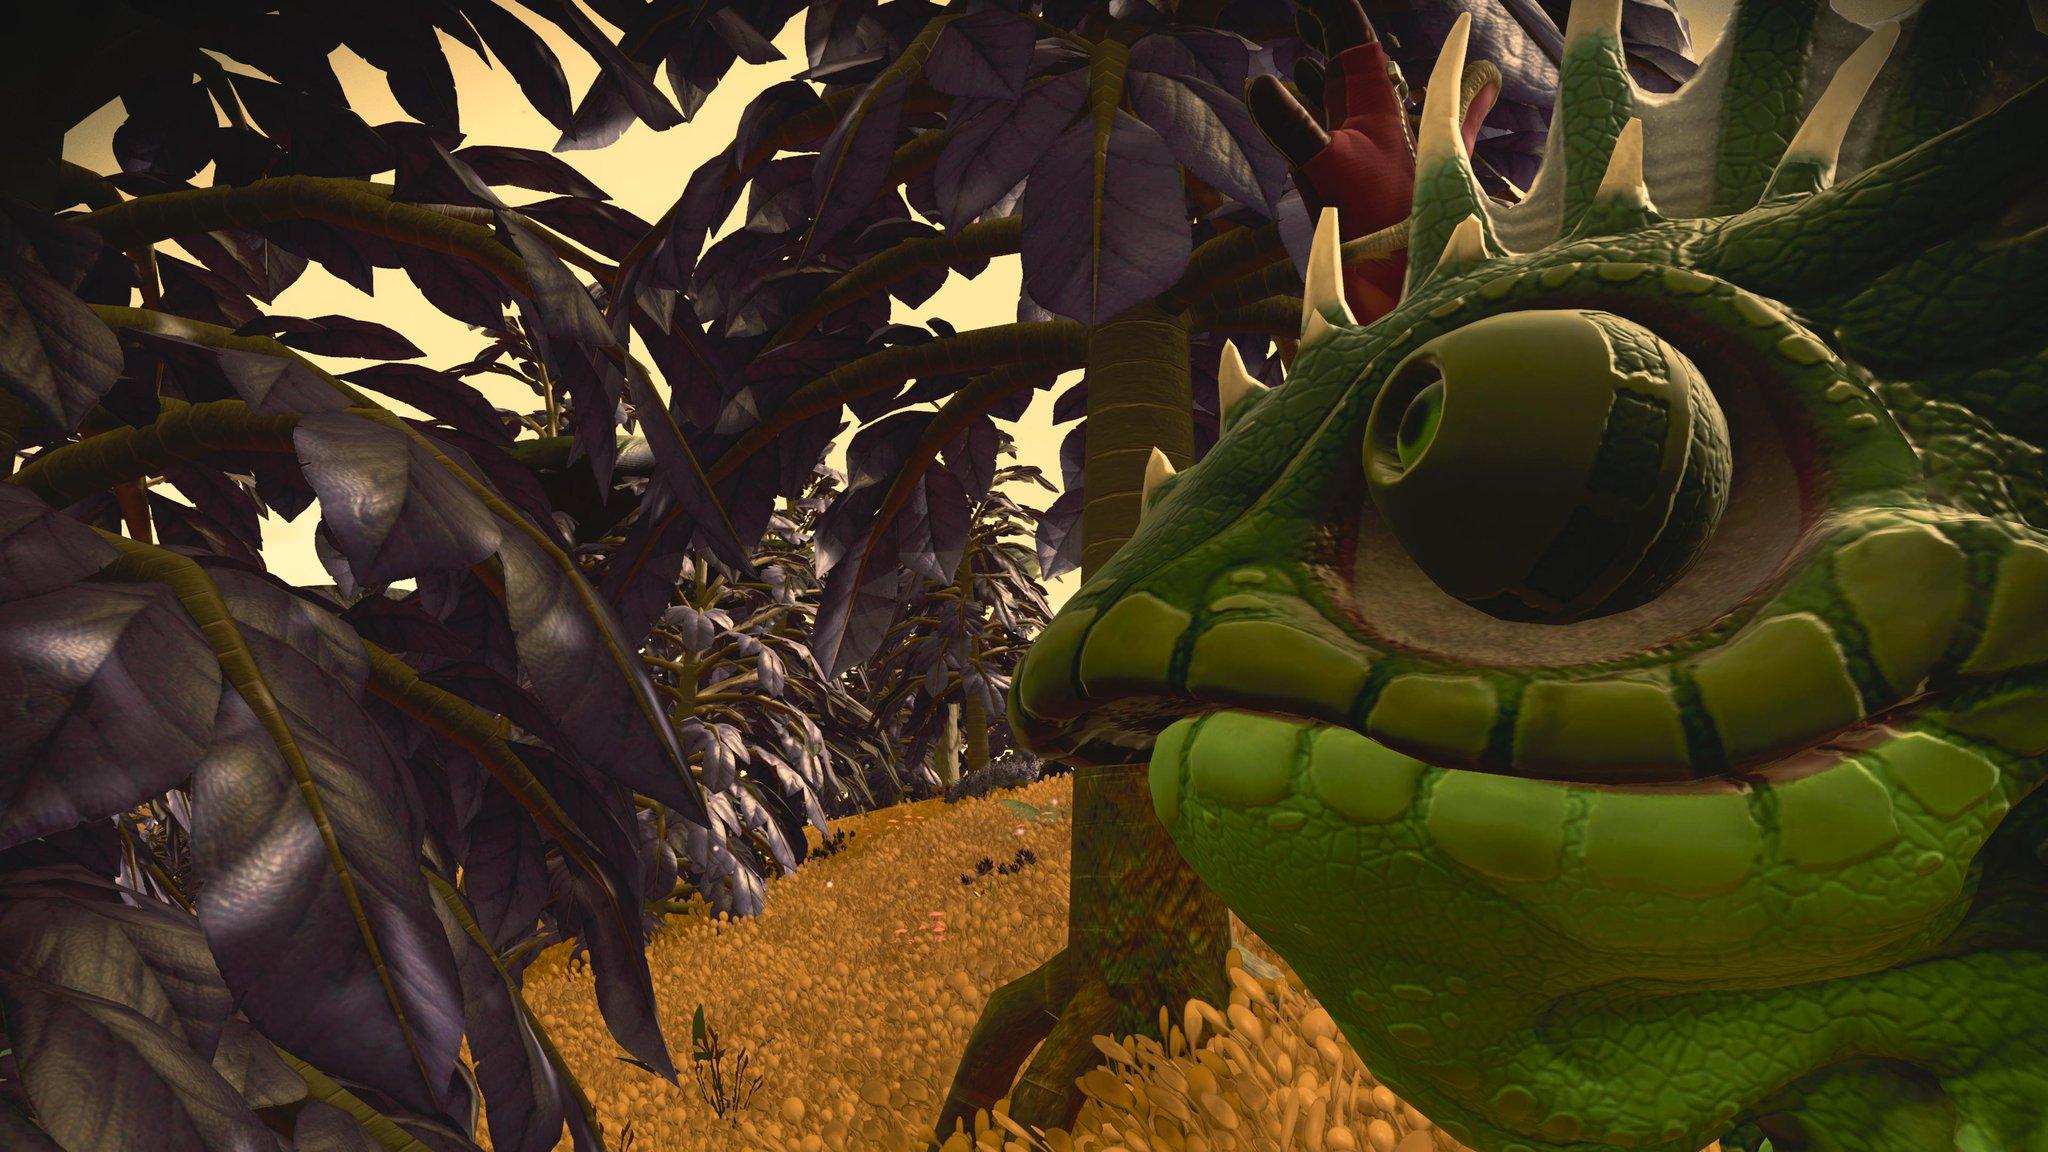 The same lizard chum, walking through the woods.